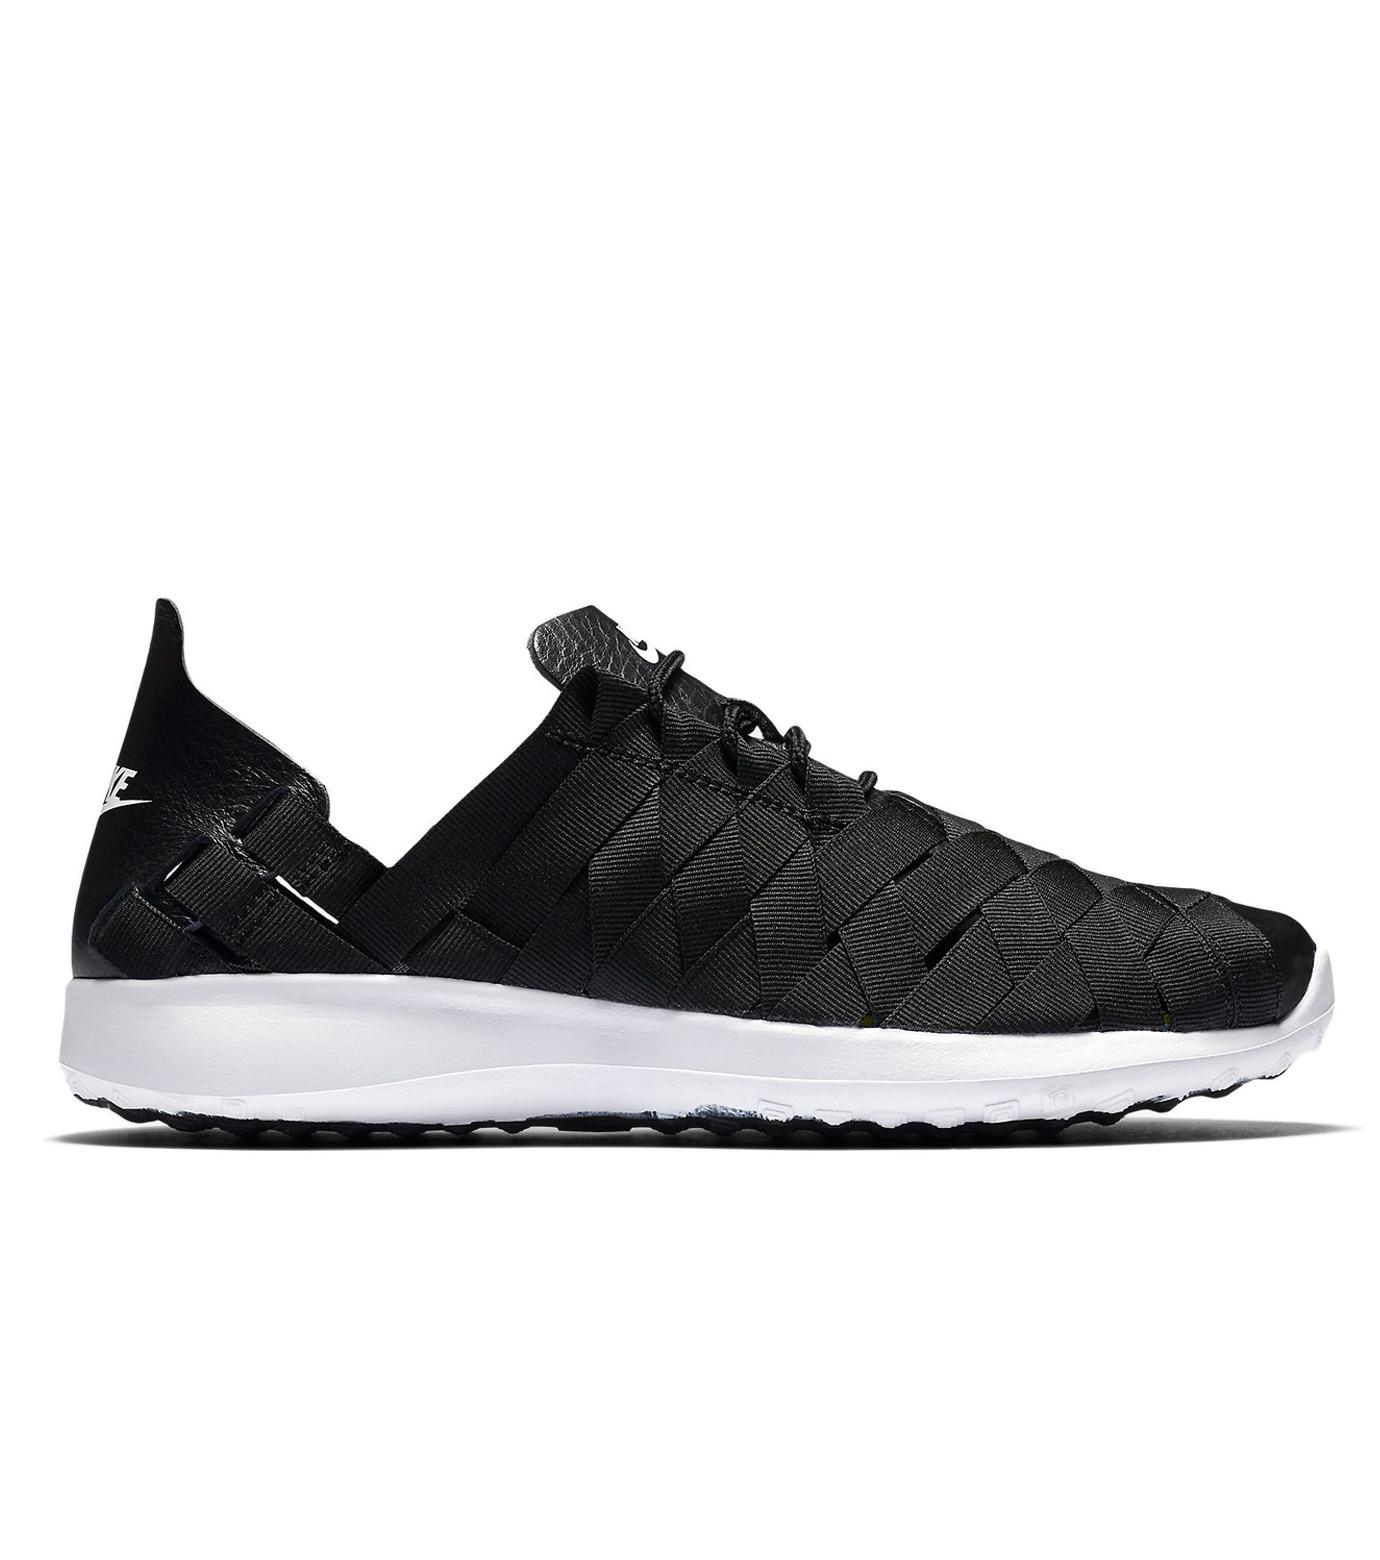 NIKE(ナイキ)のW JUVENATE-BLACK(シューズ/shoes)-833824-001-13 拡大詳細画像1